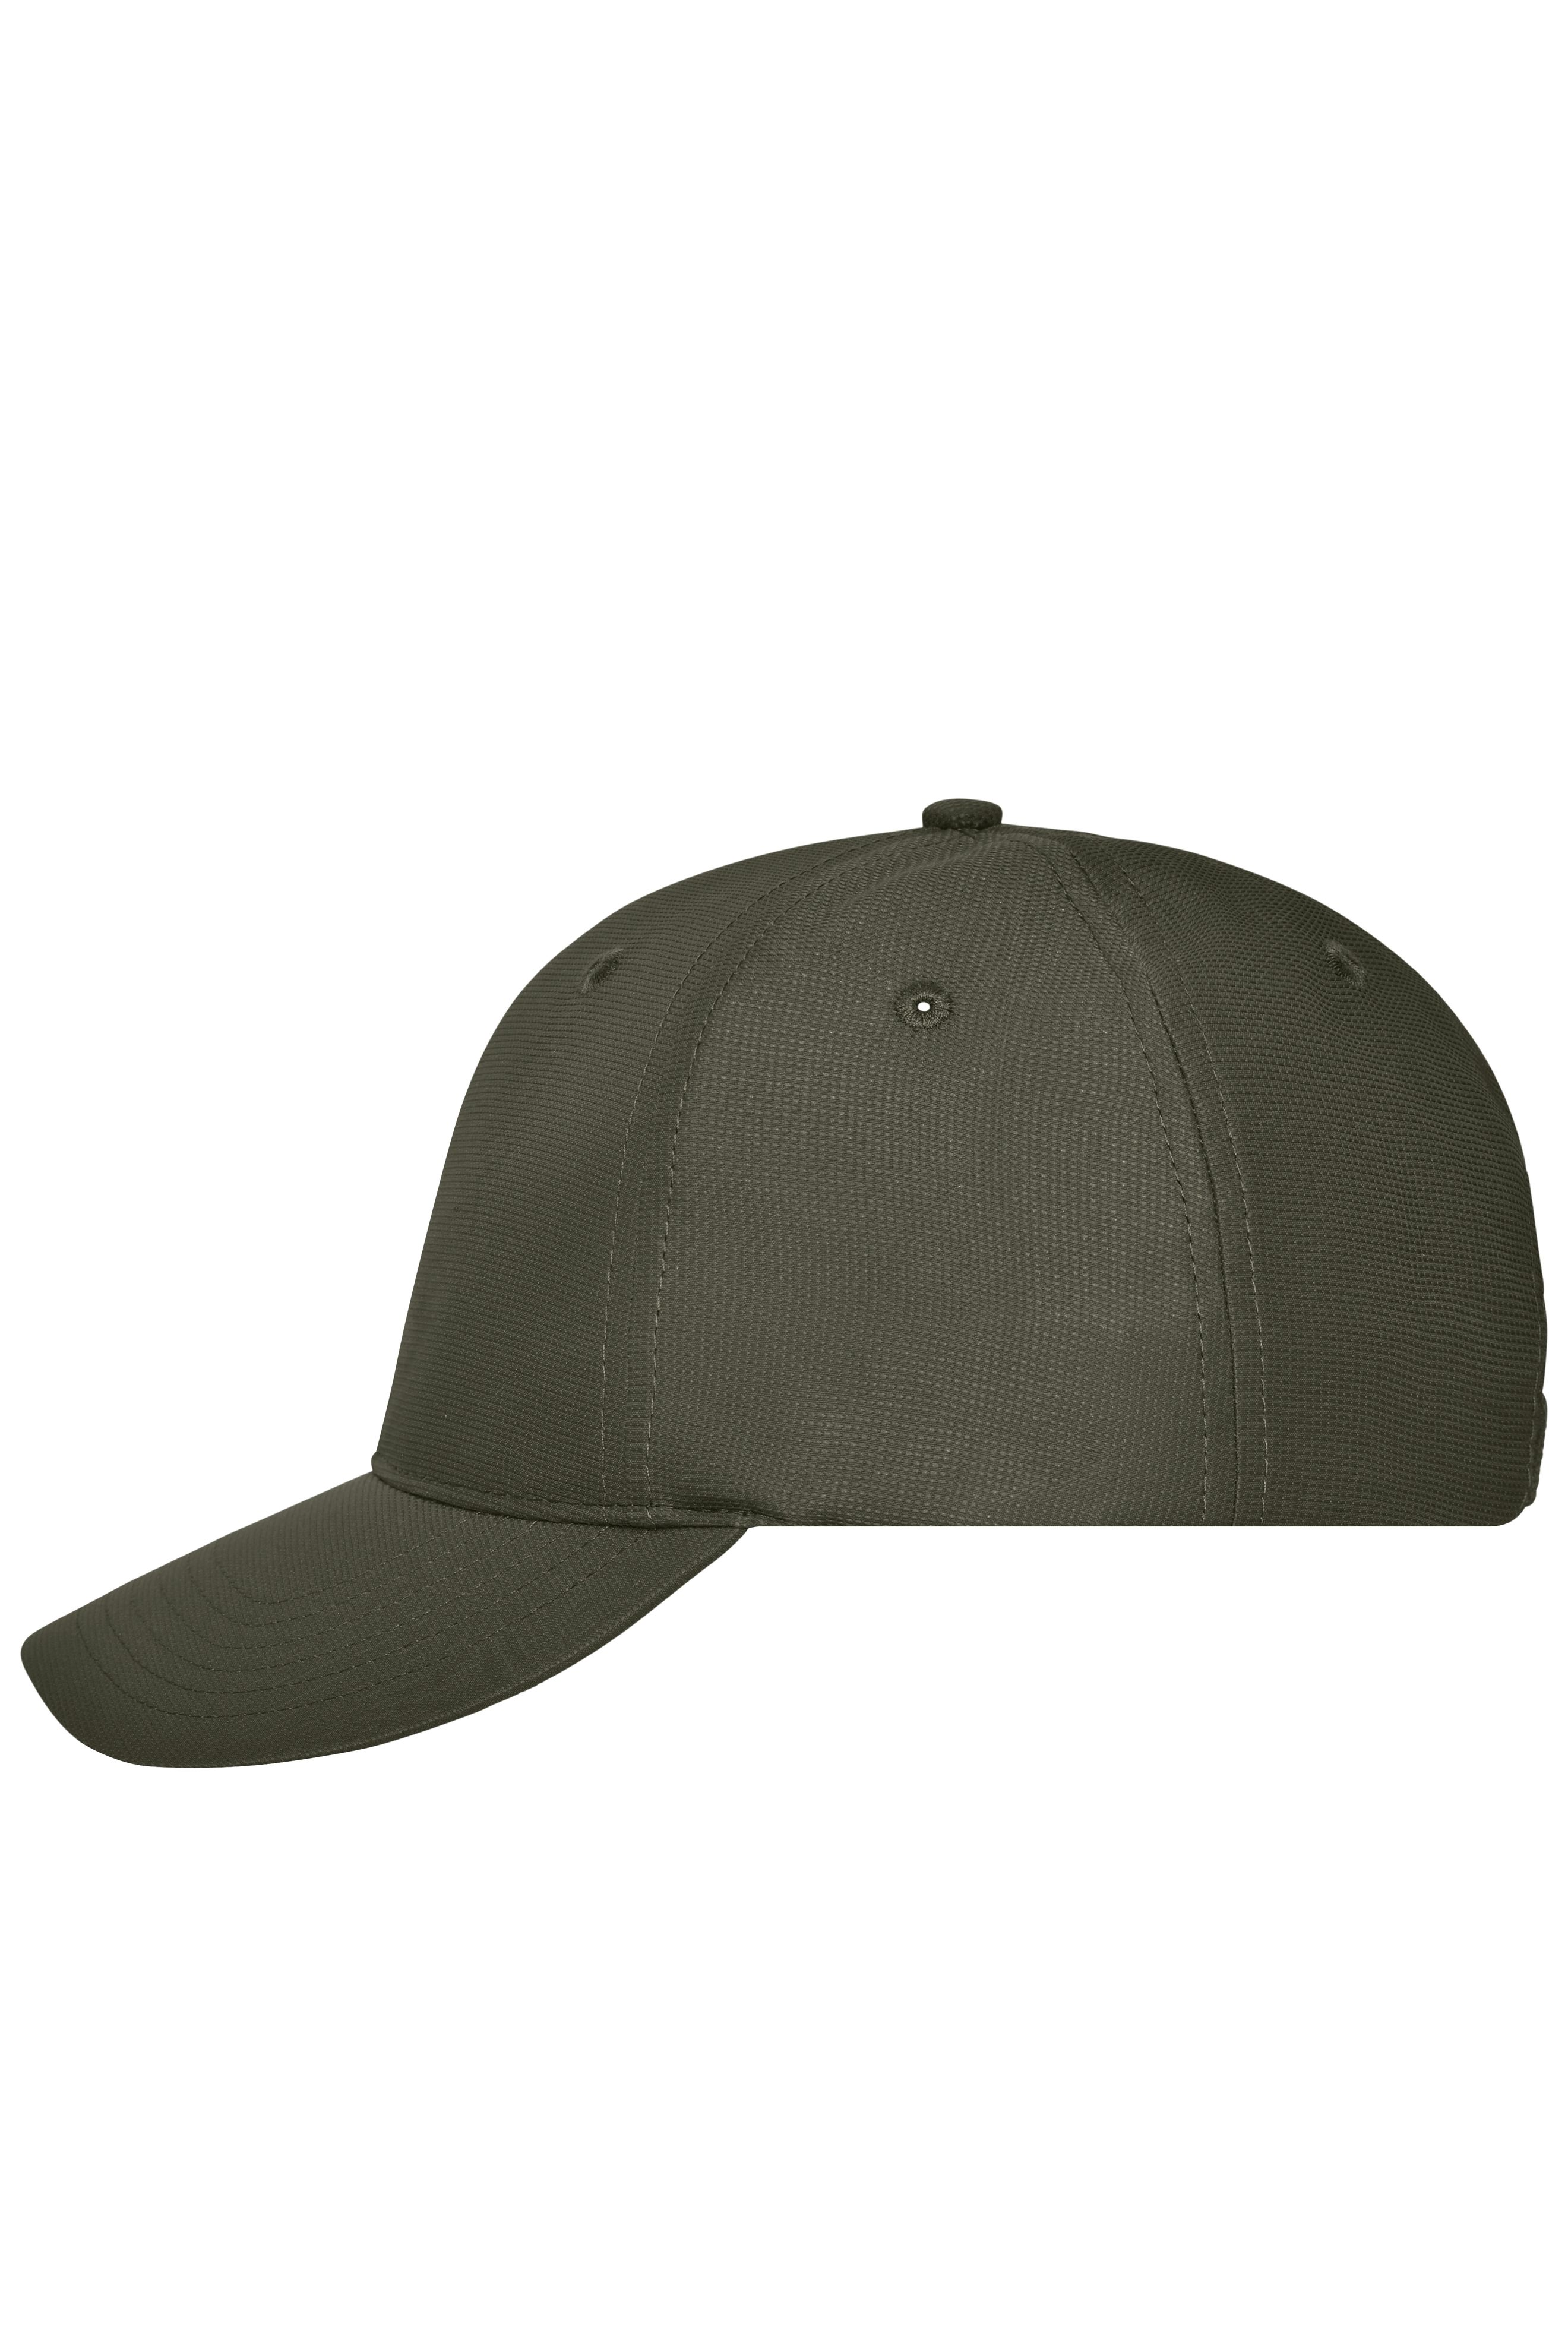 6 Panel Sun-Protection Cap